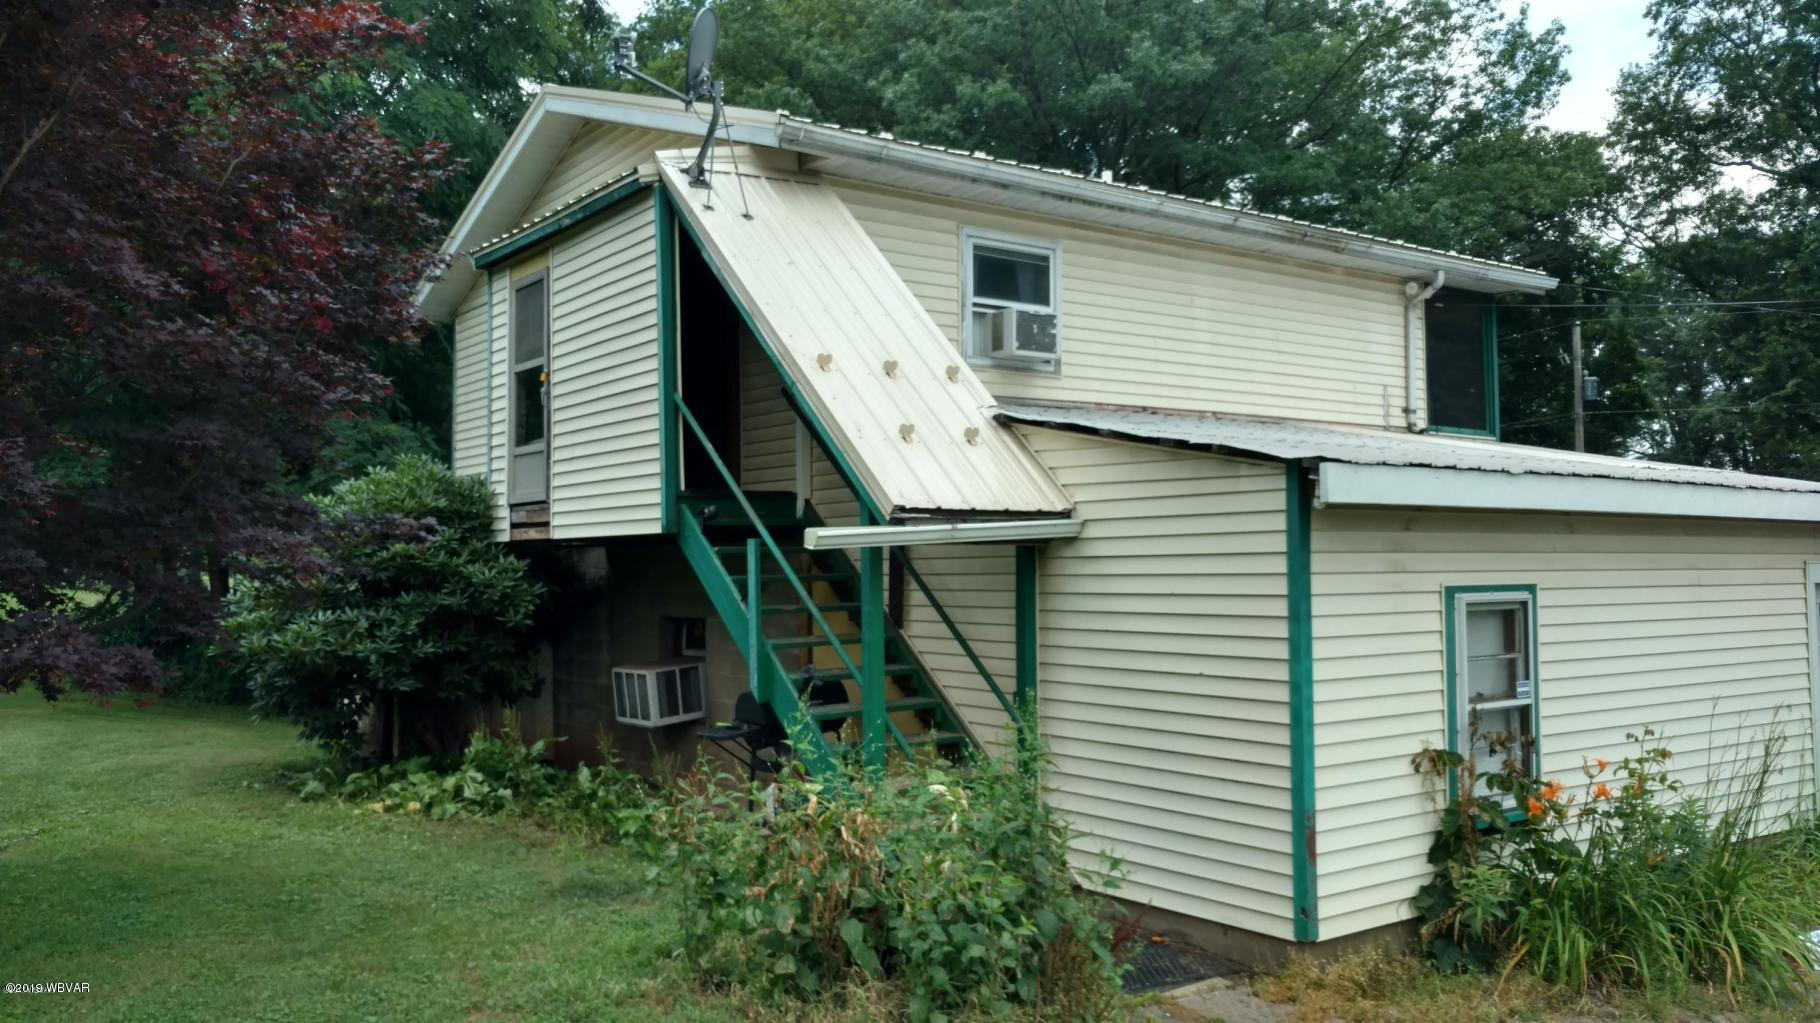 2882 REACH ROAD, Williamsport, PA 17701, 1 Bedroom Bedrooms, ,1 BathroomBathrooms,Resid-lease/rental,For sale,REACH,WB-91013